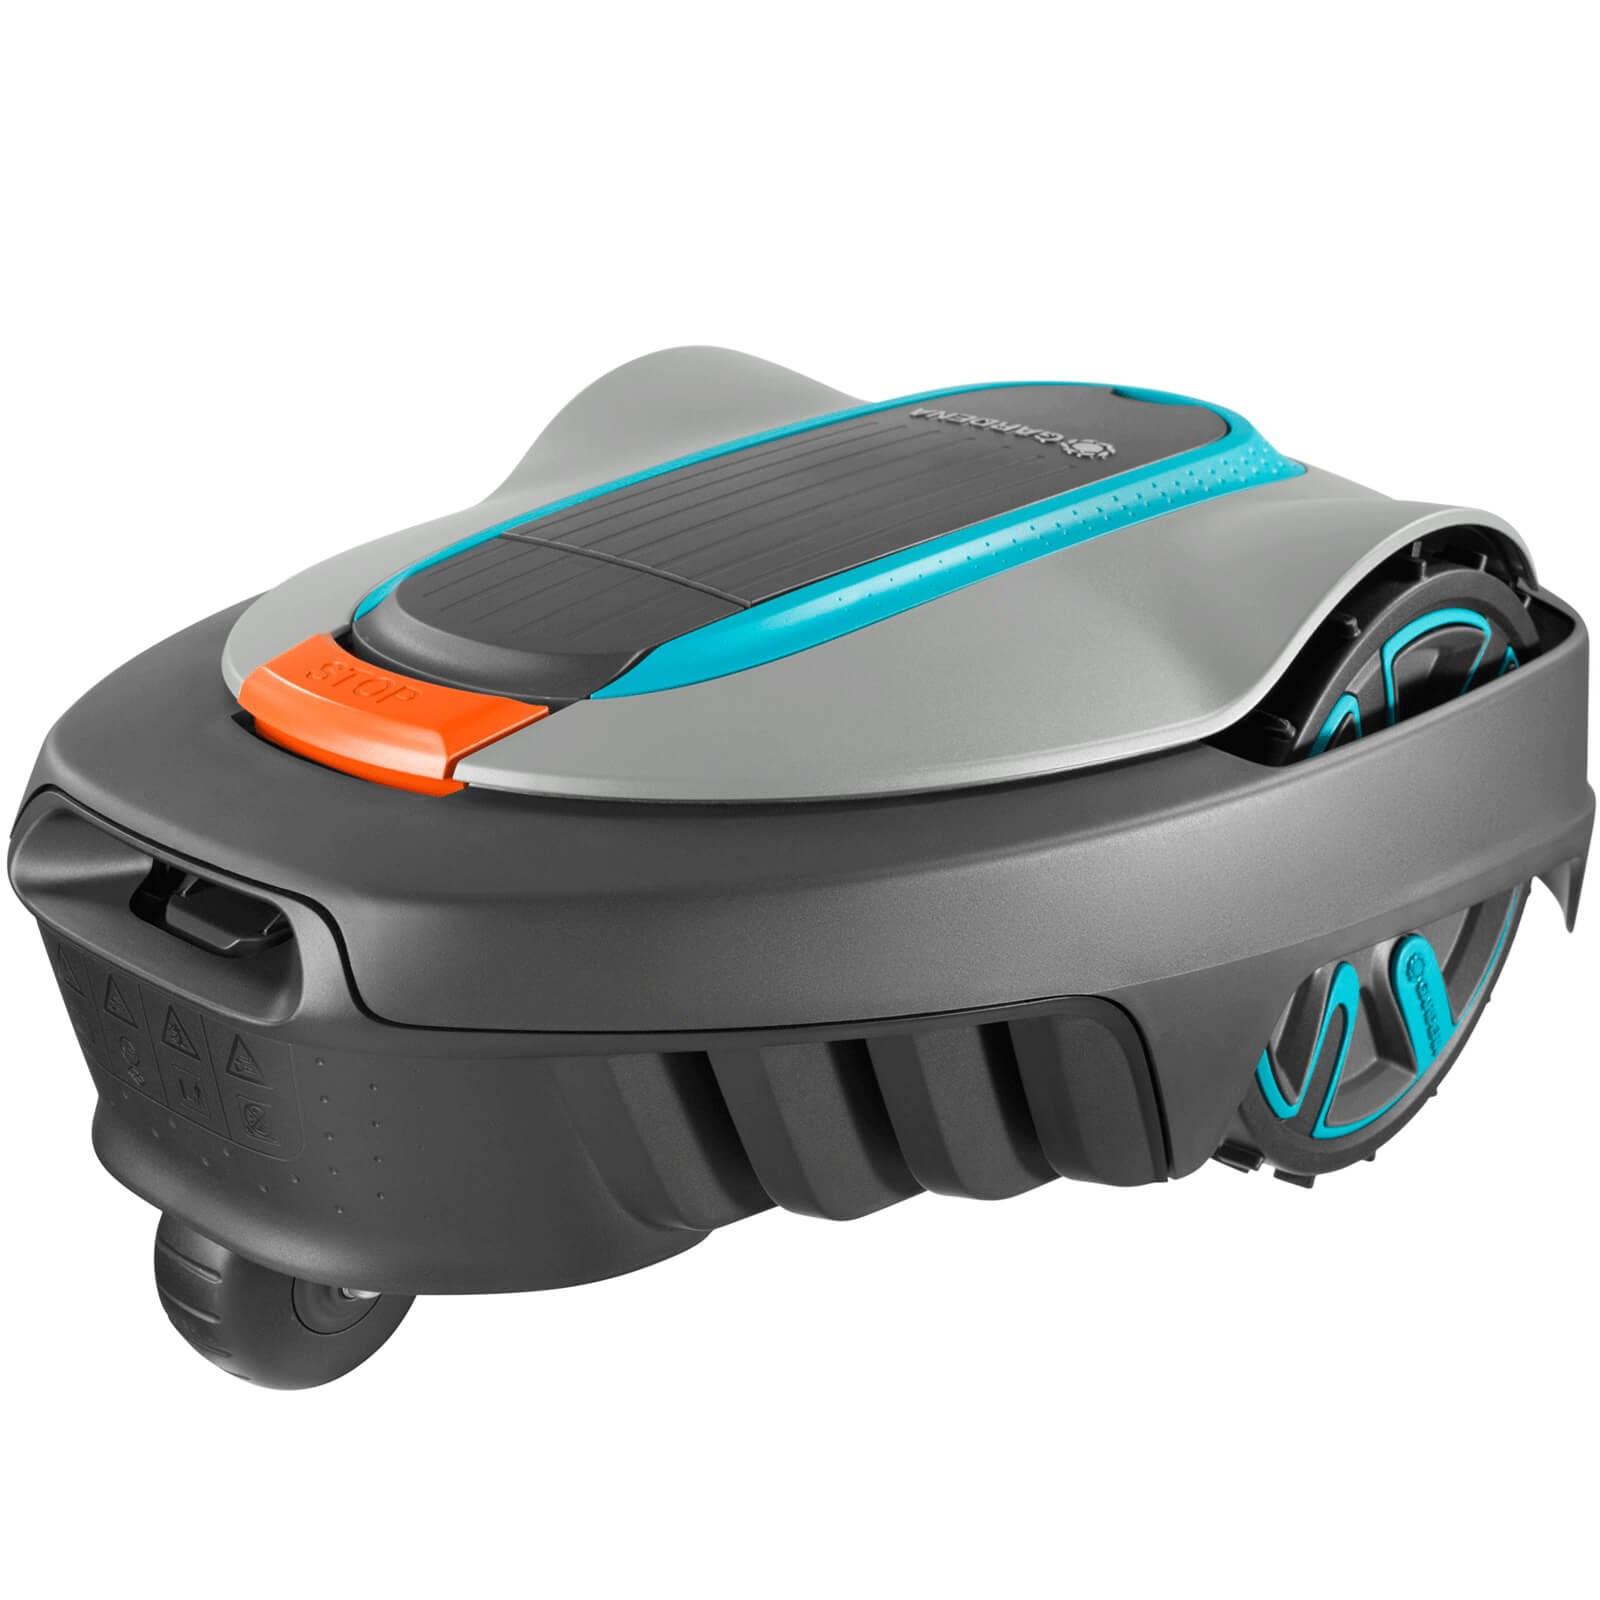 Gardena Smart Sileno City Robotic Lawnmower